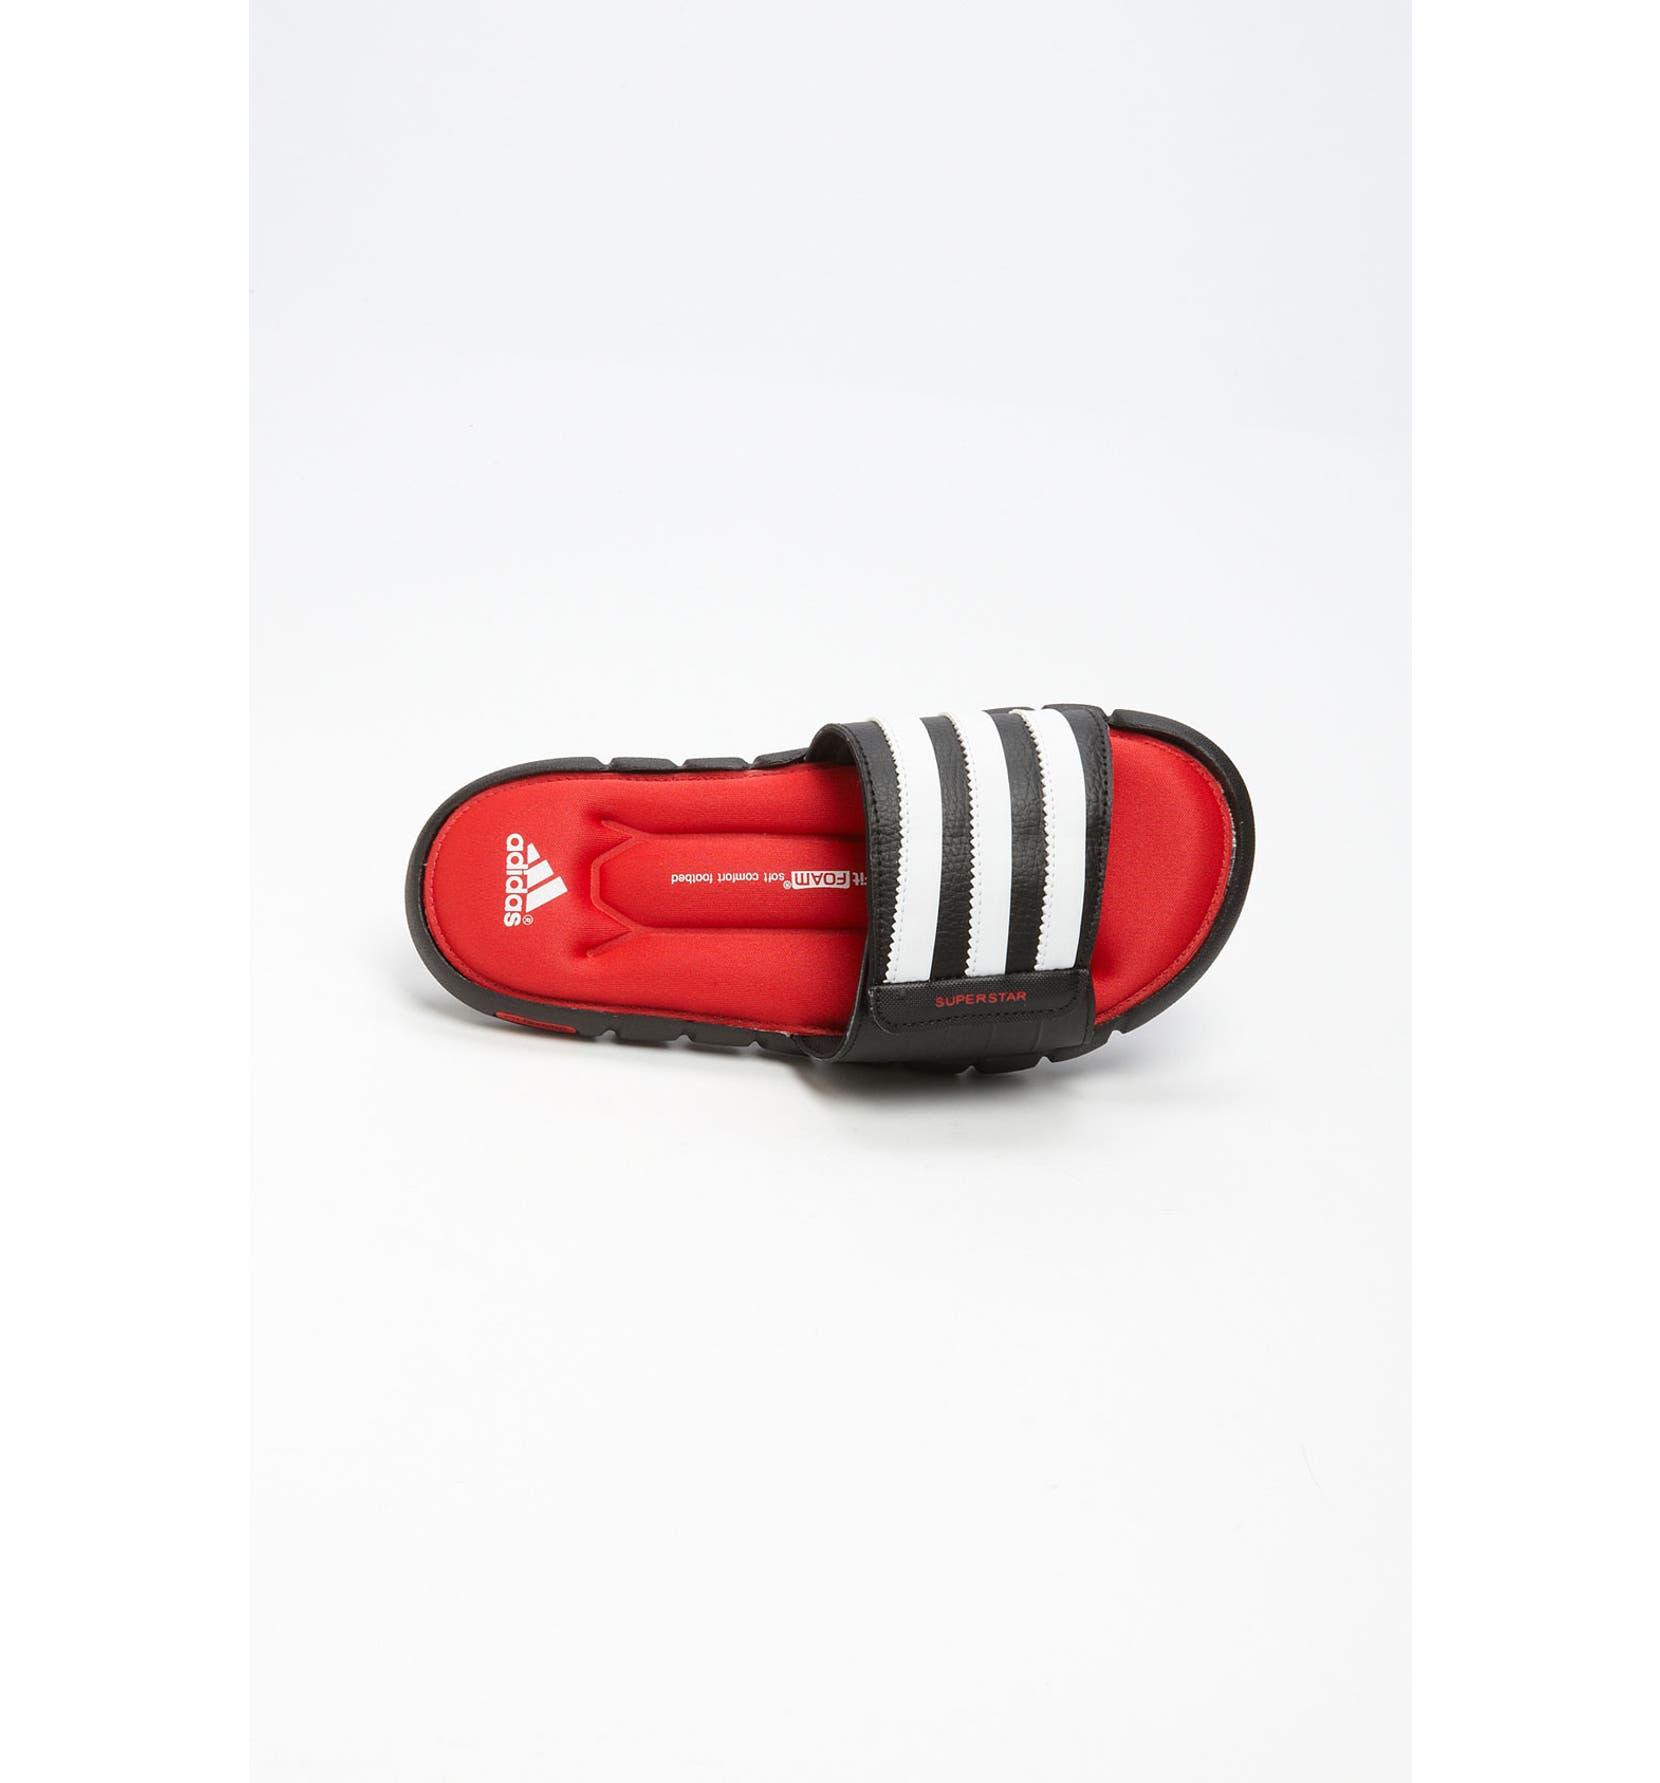 3g' Adidas SandalNordstrom SandalNordstrom 'superstar 3g' Adidas 'superstar 'superstar 3g' SandalNordstrom Adidas 8nX0wOPkN